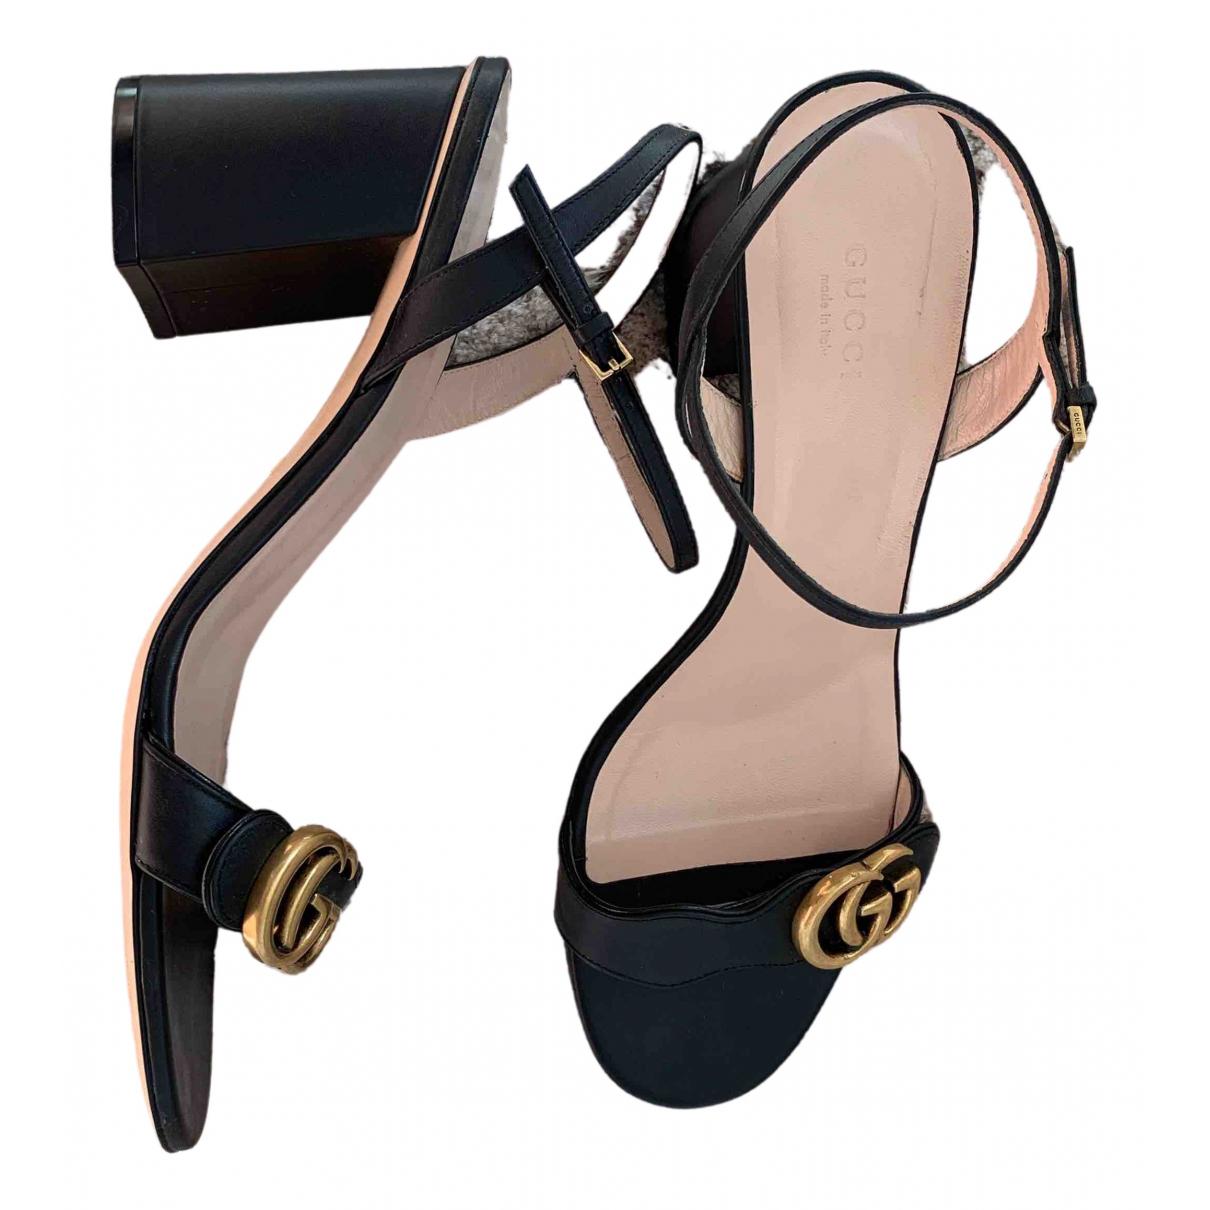 Sandalias romanas Marmont de Cuero Gucci